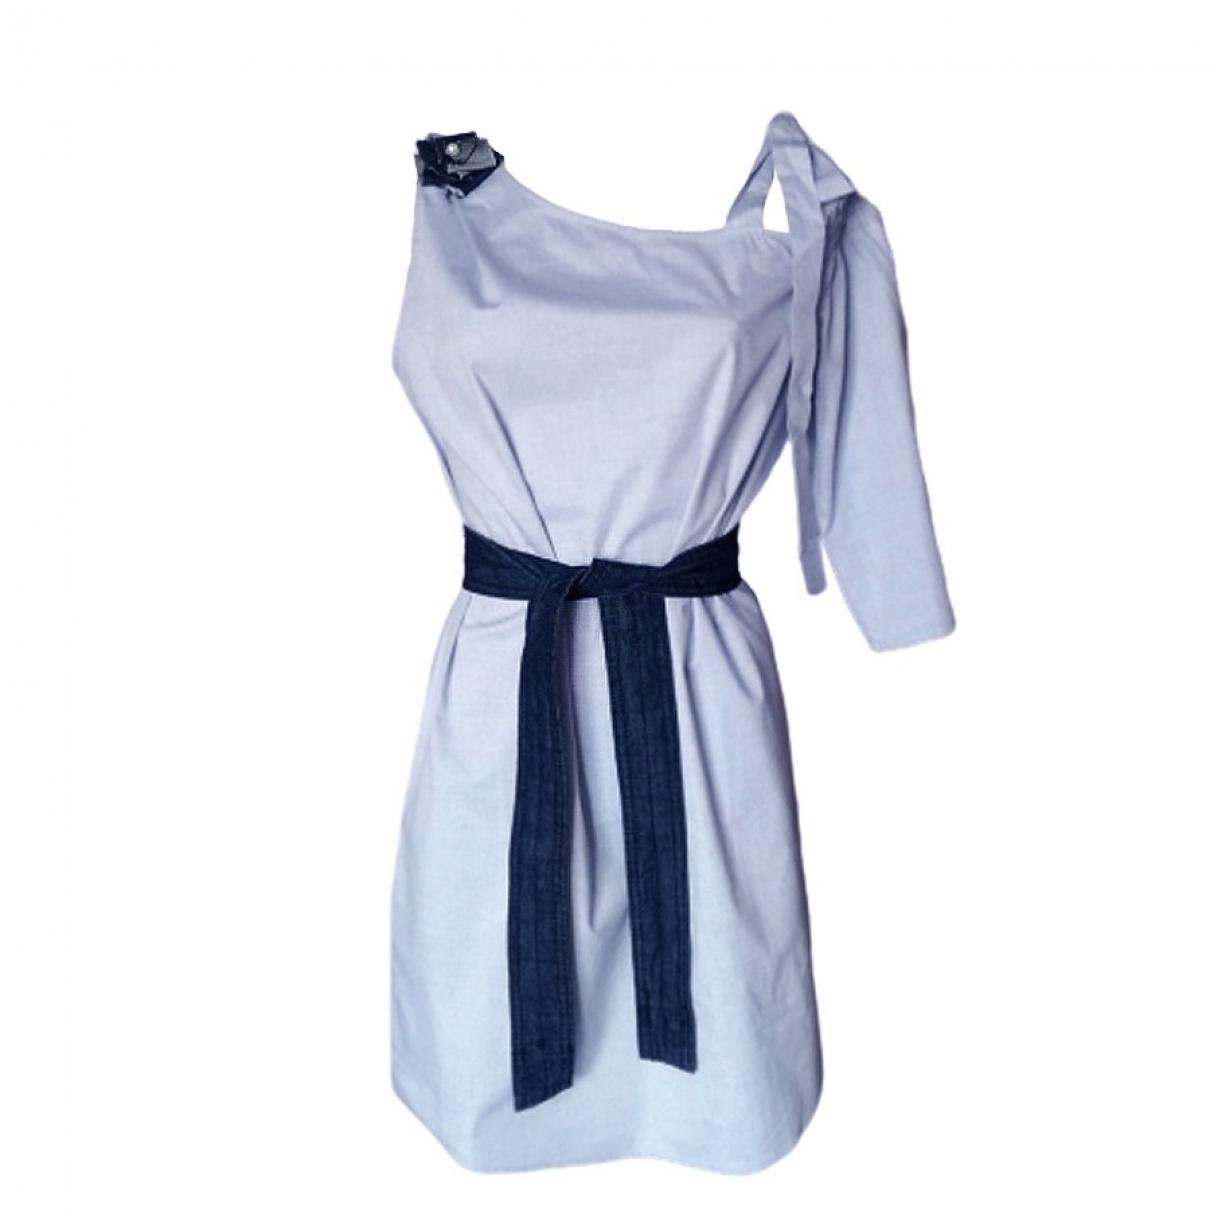 Hoss Intropia - Robe   pour femme en coton - bleu